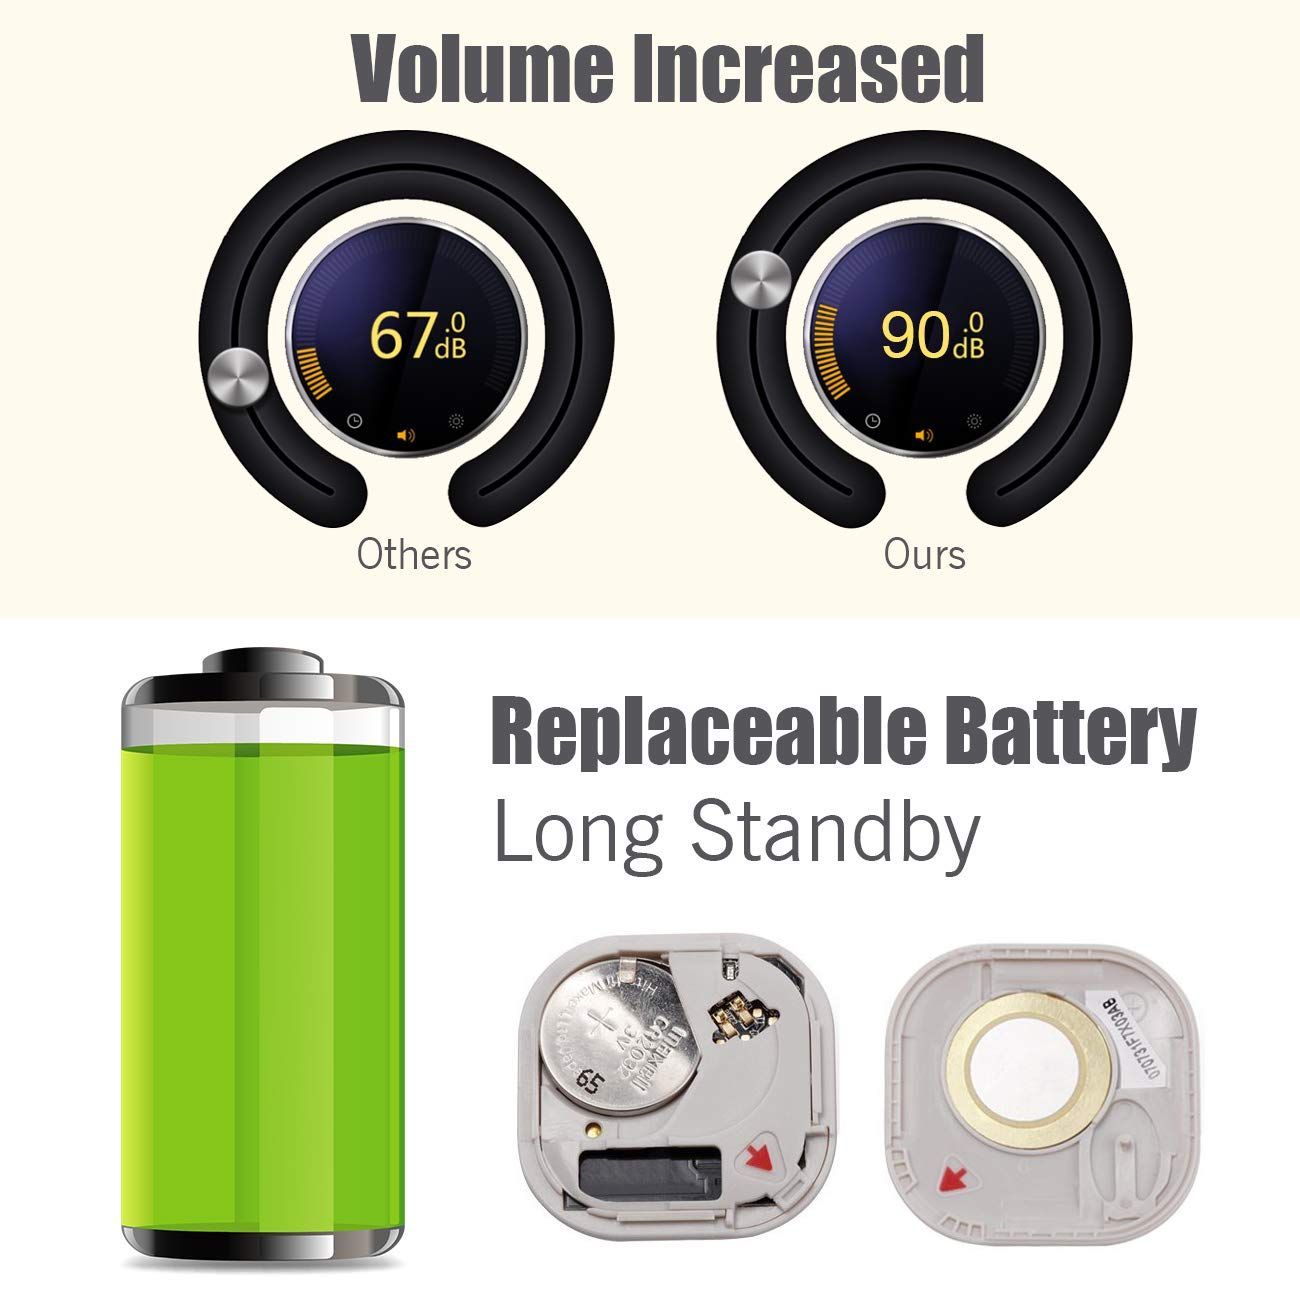 Nutale Focus Smart Key Finder Bluetooth Wifi Tracker Locator Wallet Phone Key Antilost Bidirectional Alarm Reminder Blac Tracking Device Key Finder Key Locator